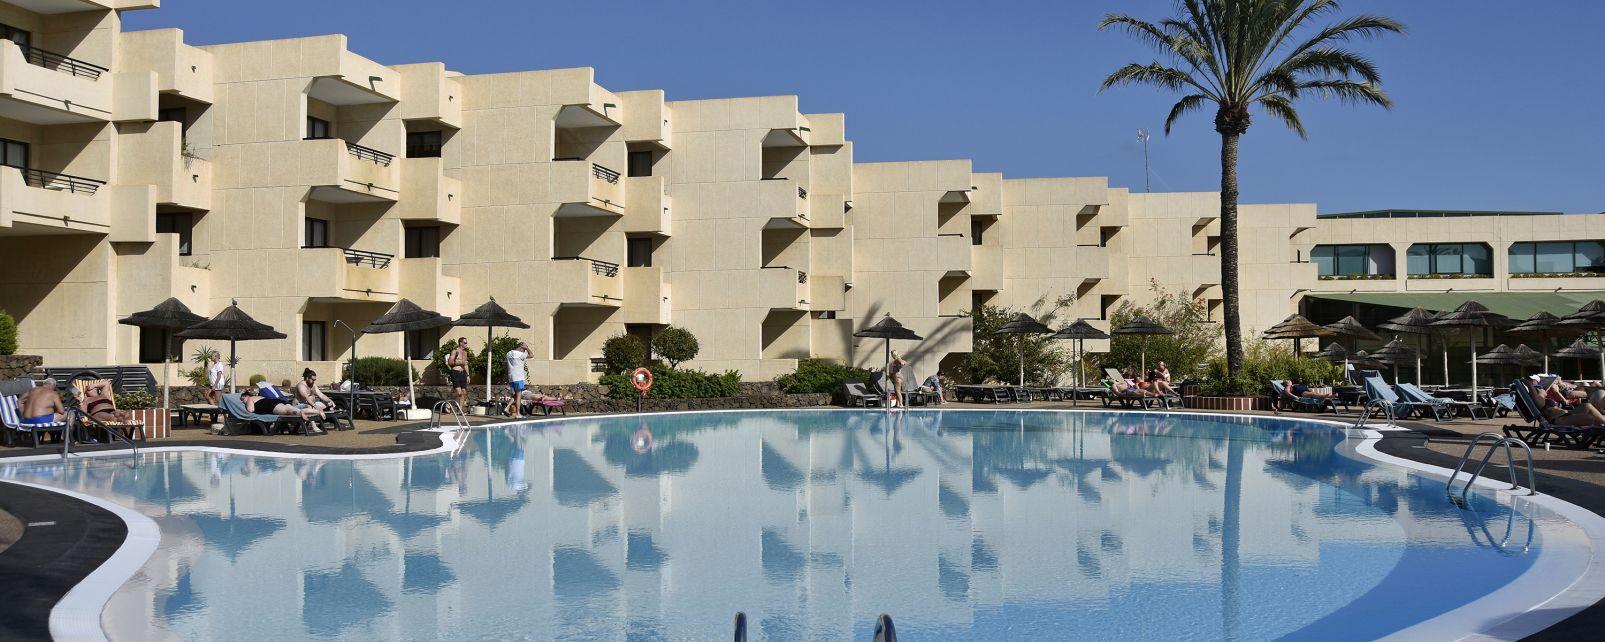 Ôclub Experience Occidental Lanzarote Mar